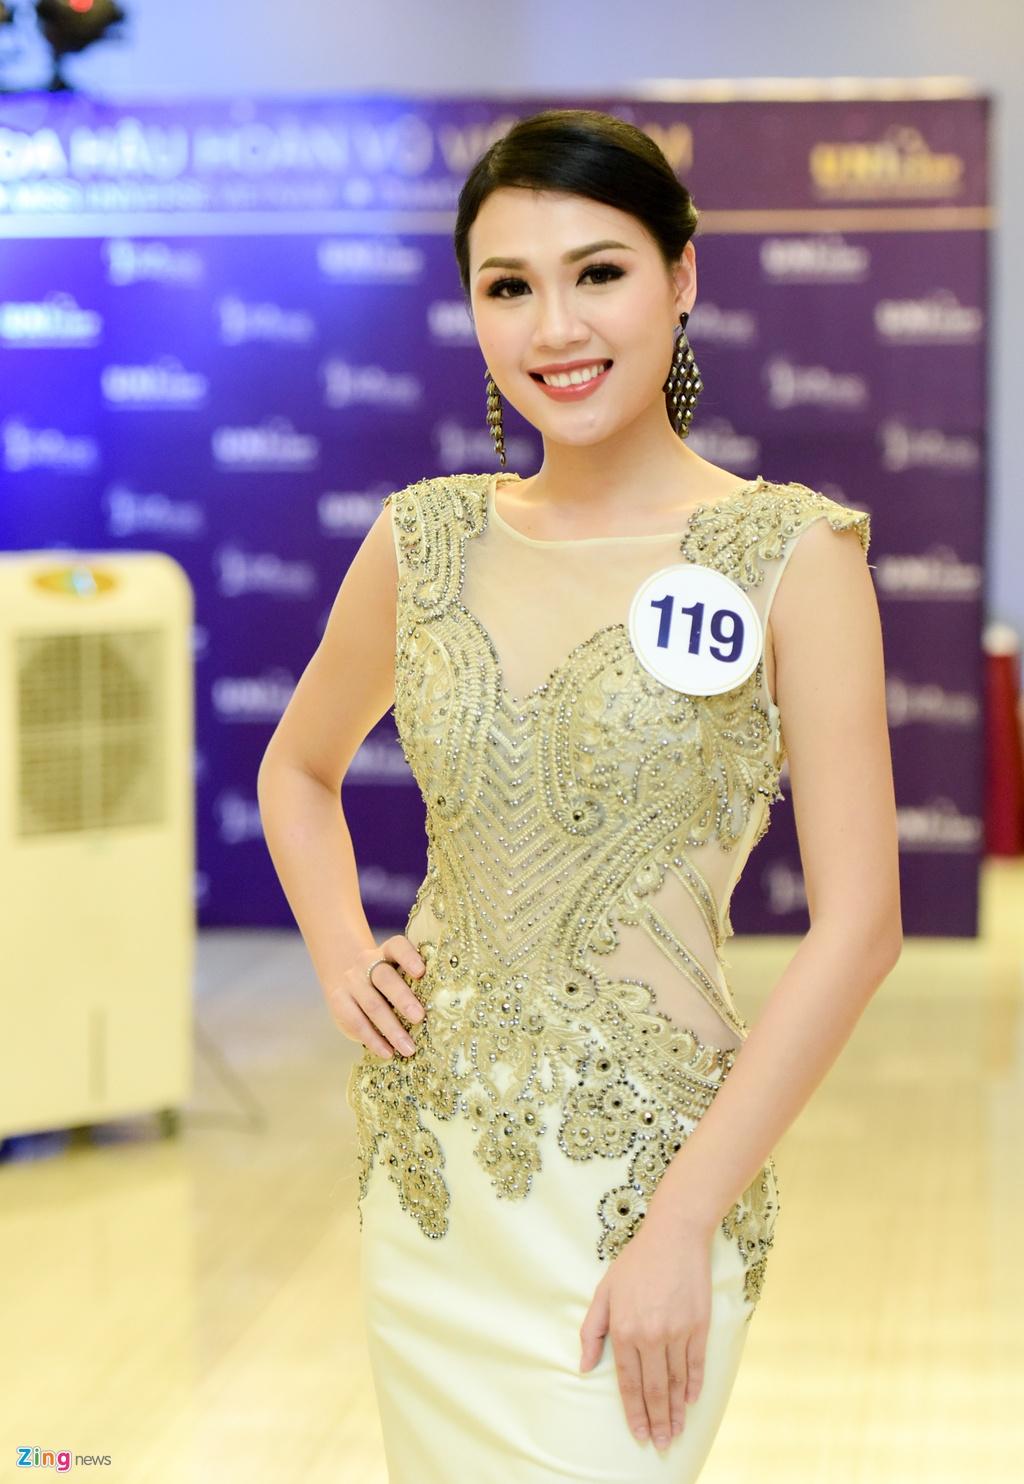 Nhan sac thi sinh Hoa hau Hoan vu Viet Nam truoc dem chung ket hinh anh 8